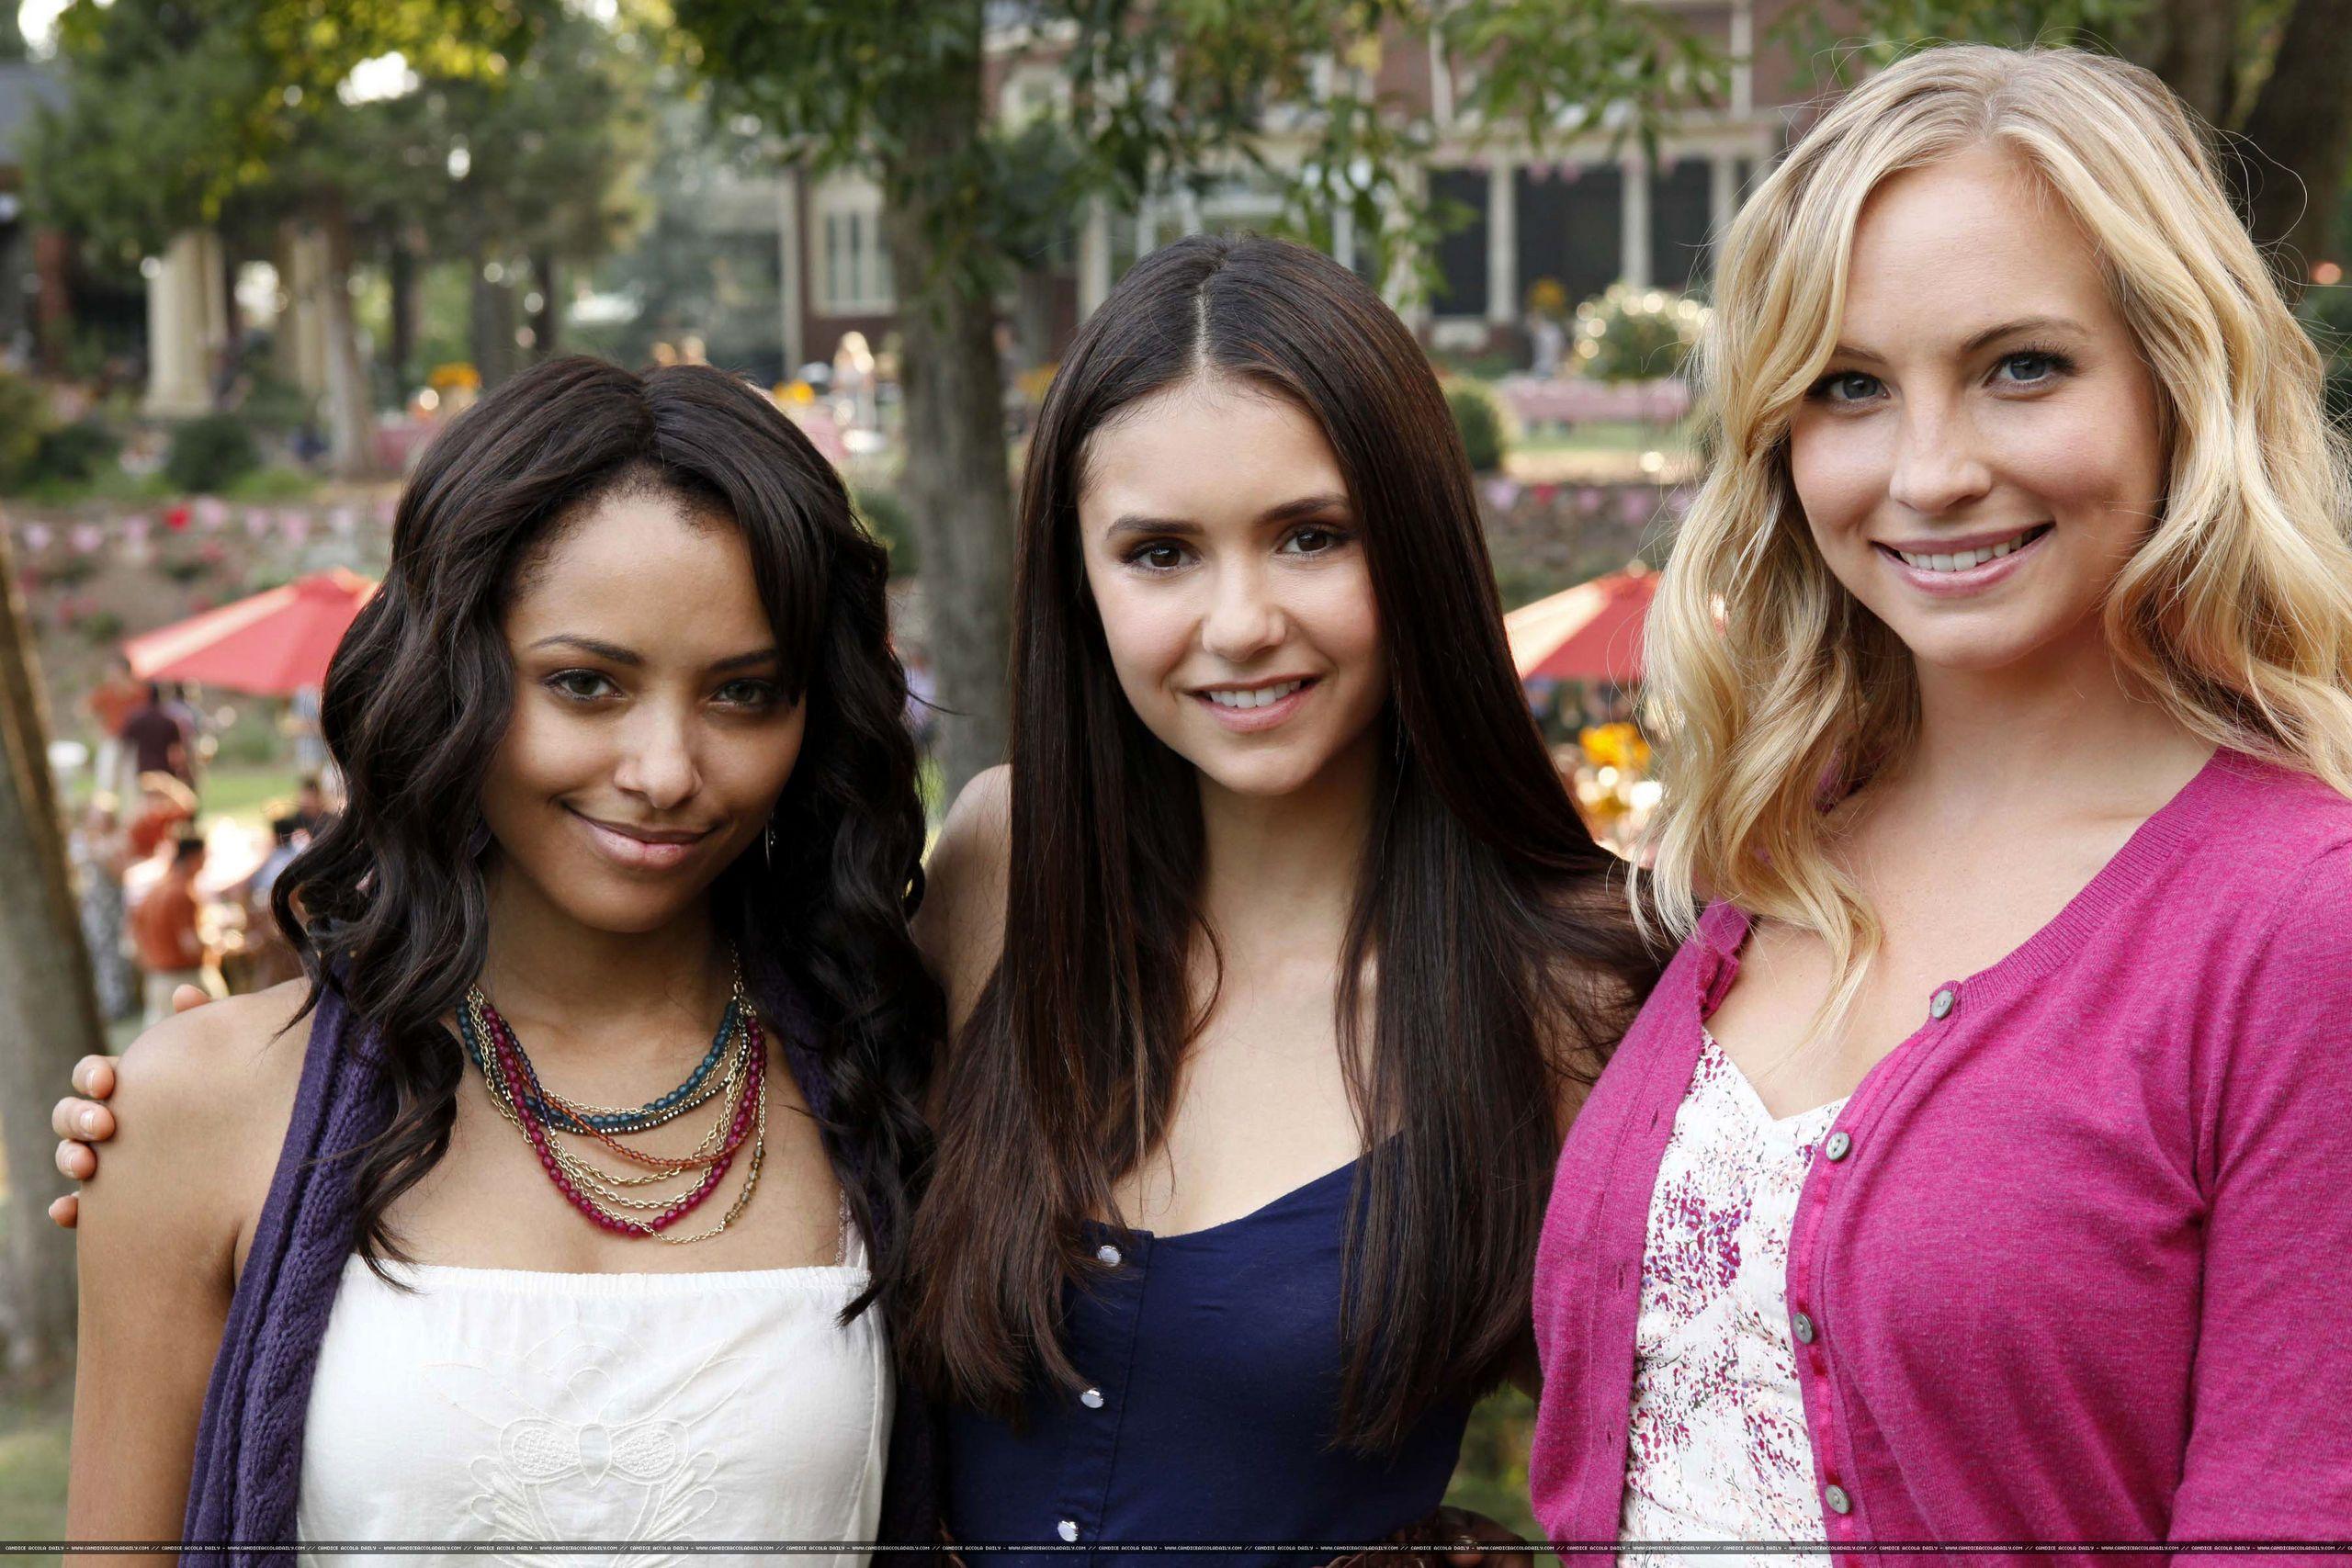 Behind The Scenes Of The Vampire Diaries 3x04 Disturbing Behavior Tvd